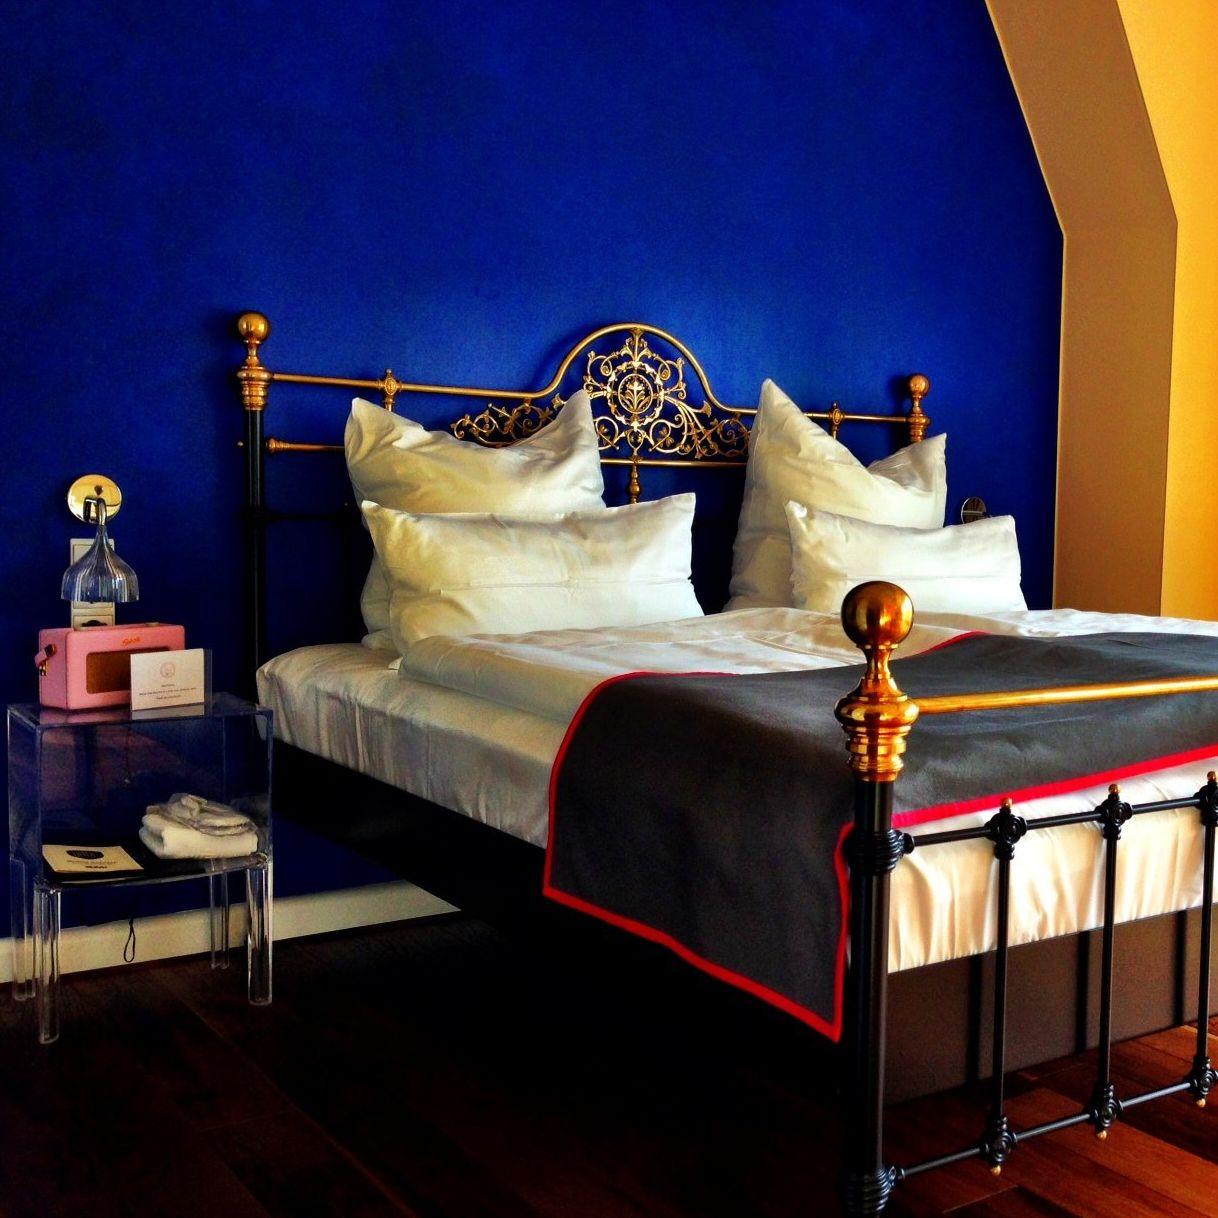 cecilie moestue the dude hotel berlin. Black Bedroom Furniture Sets. Home Design Ideas